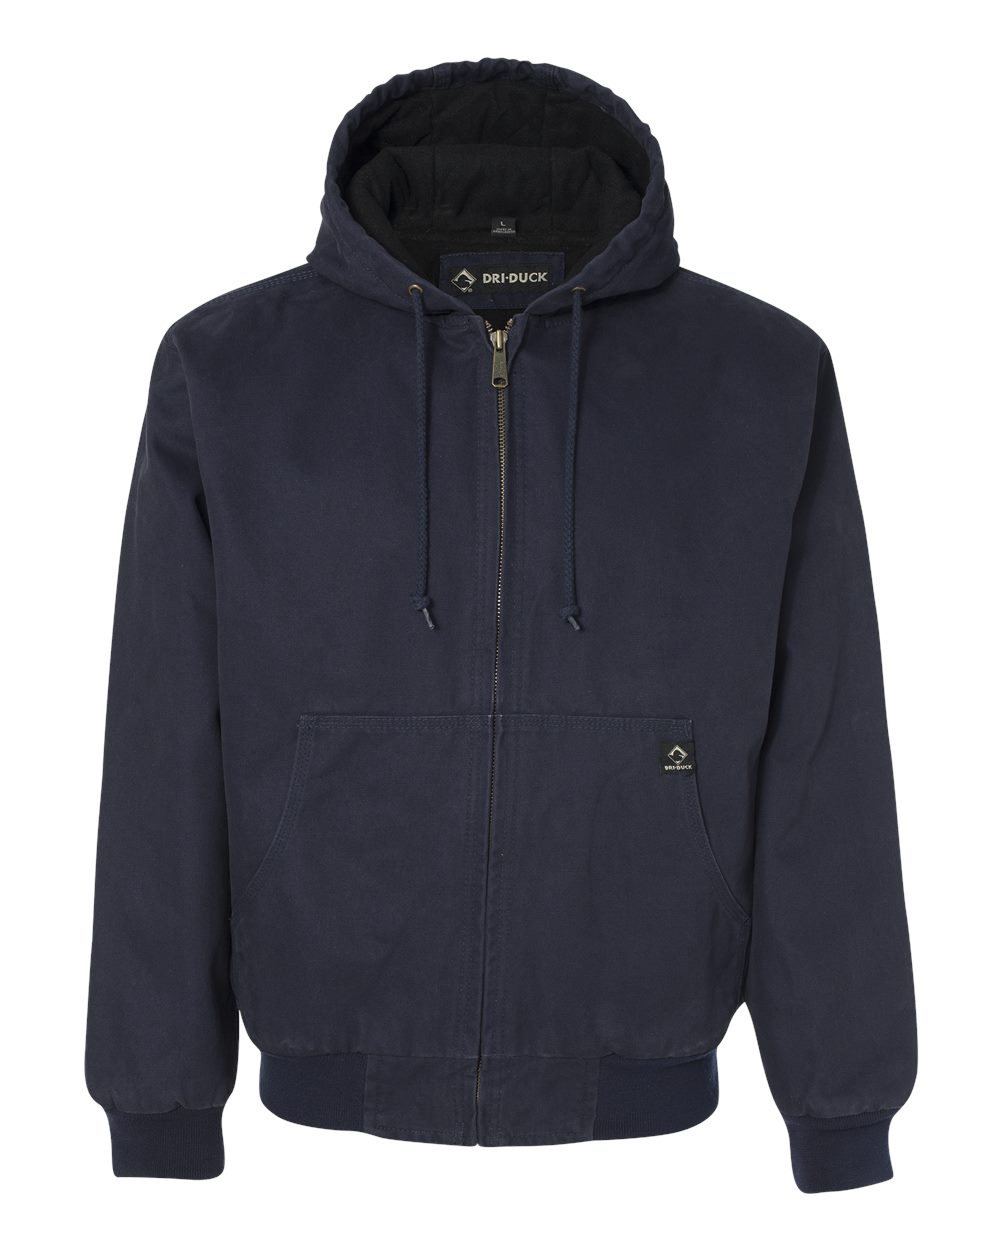 DRI DUCK - Boulder Cloth Canvas Cheyenne Hooded Jacket Tall Sizes - 5020T